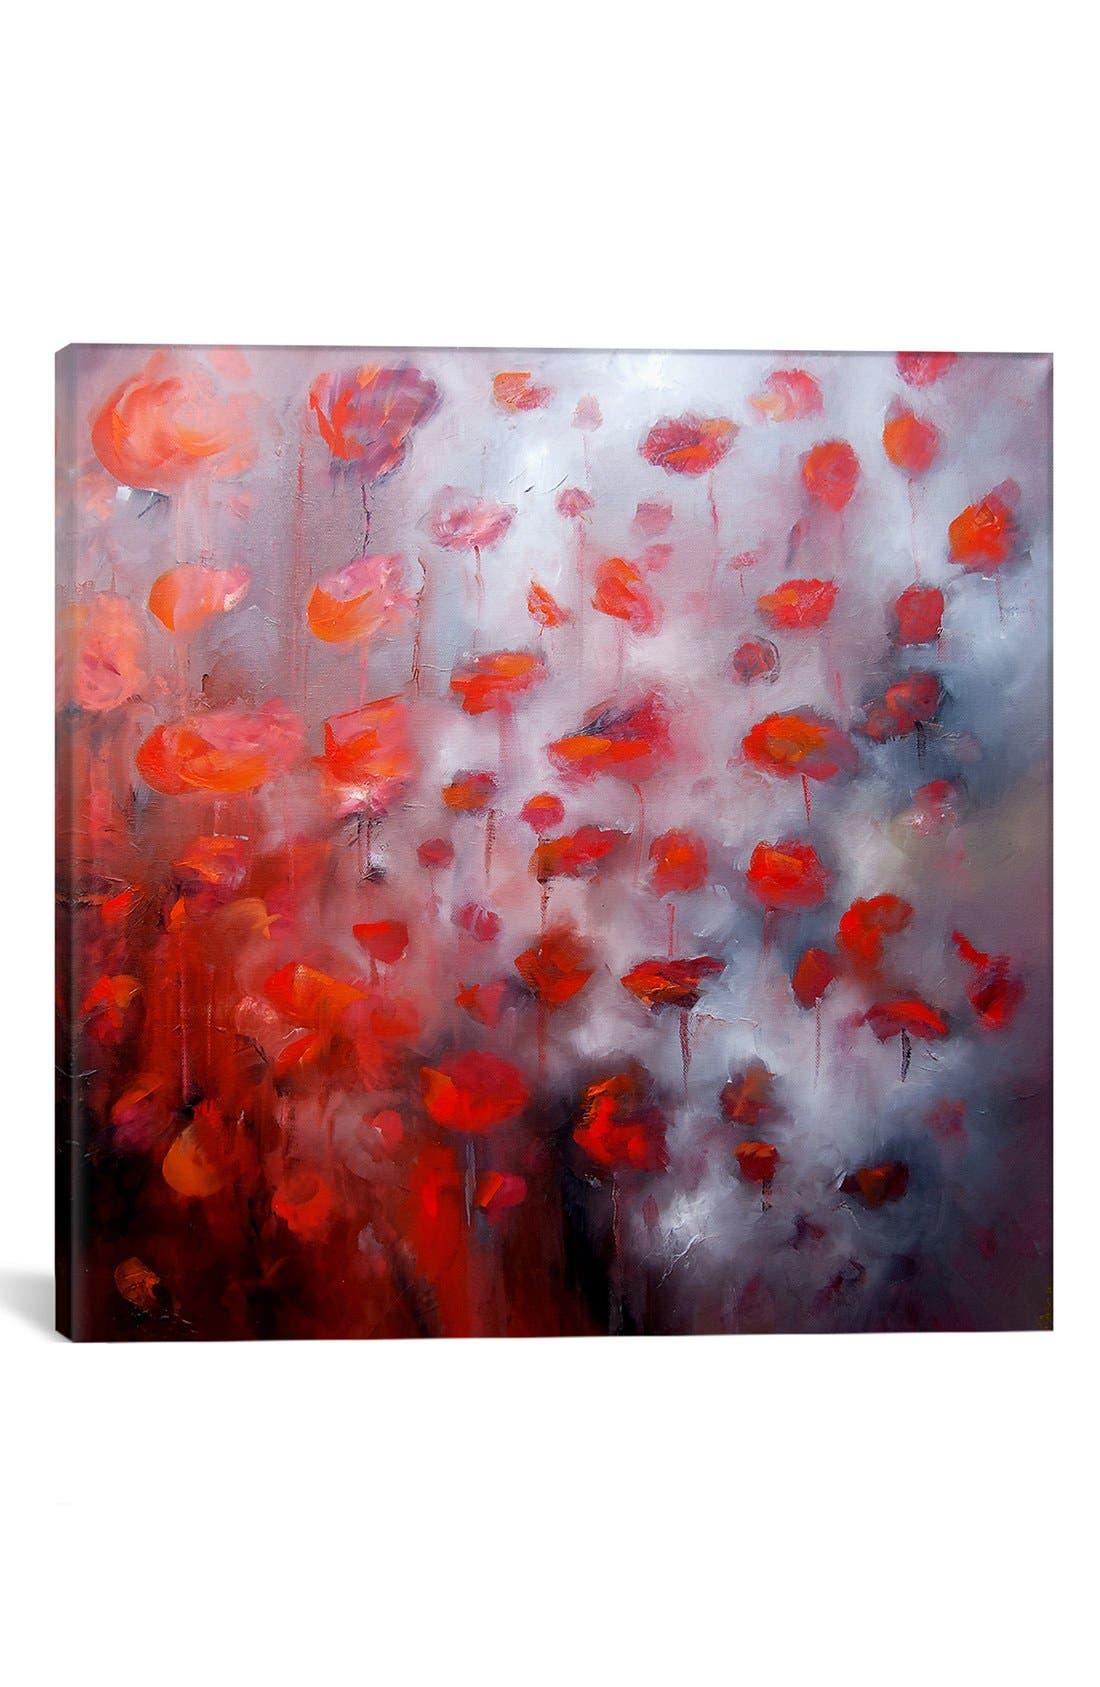 Alternate Image 1 Selected - iCanvas 'Petals in Wind' Giclée Print Canvas Art